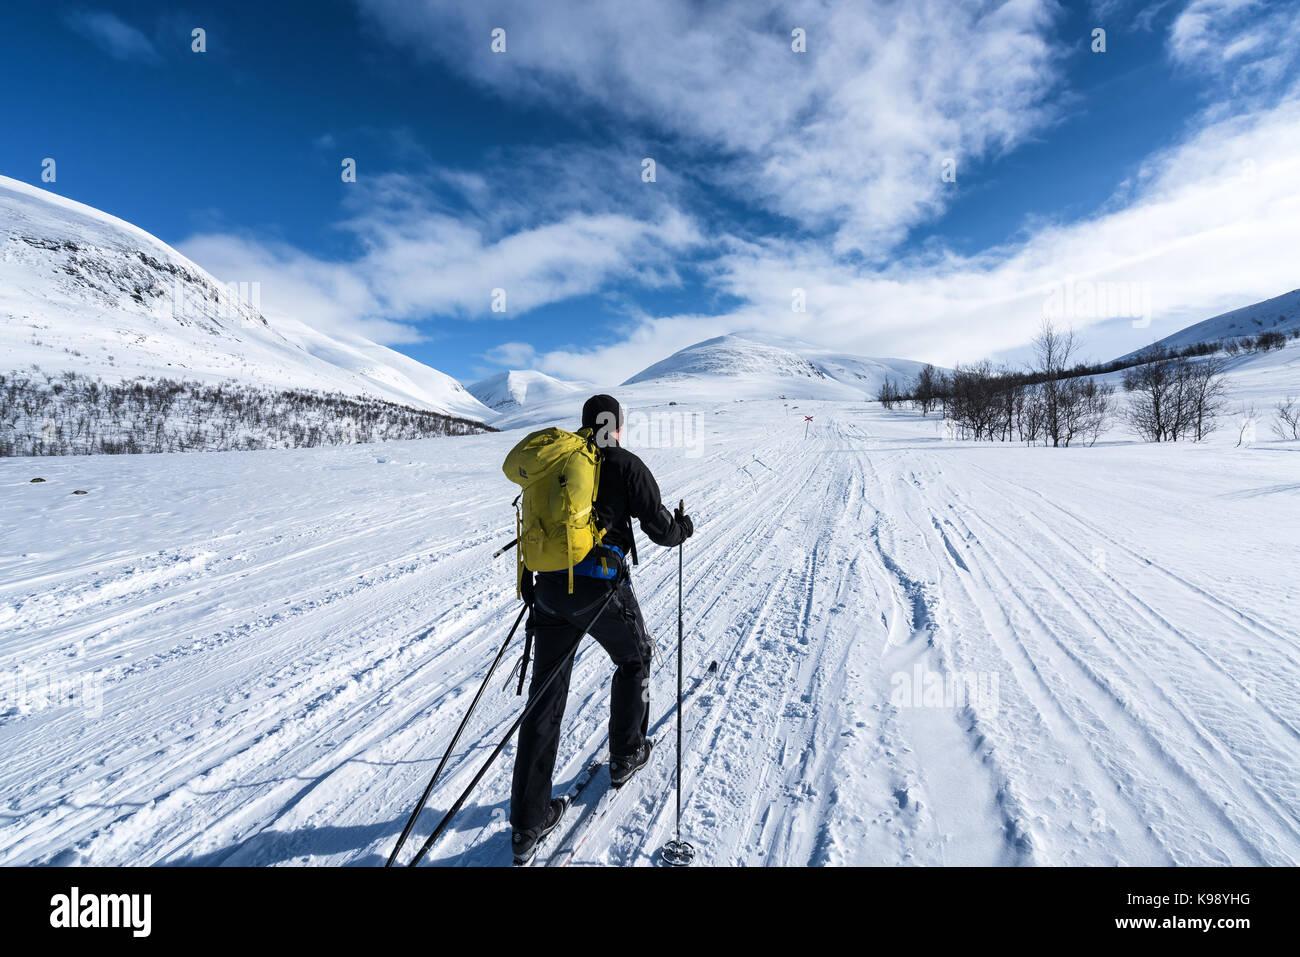 Ski touring in the Abisko national park, Sweden, Europe, EU - Stock Image